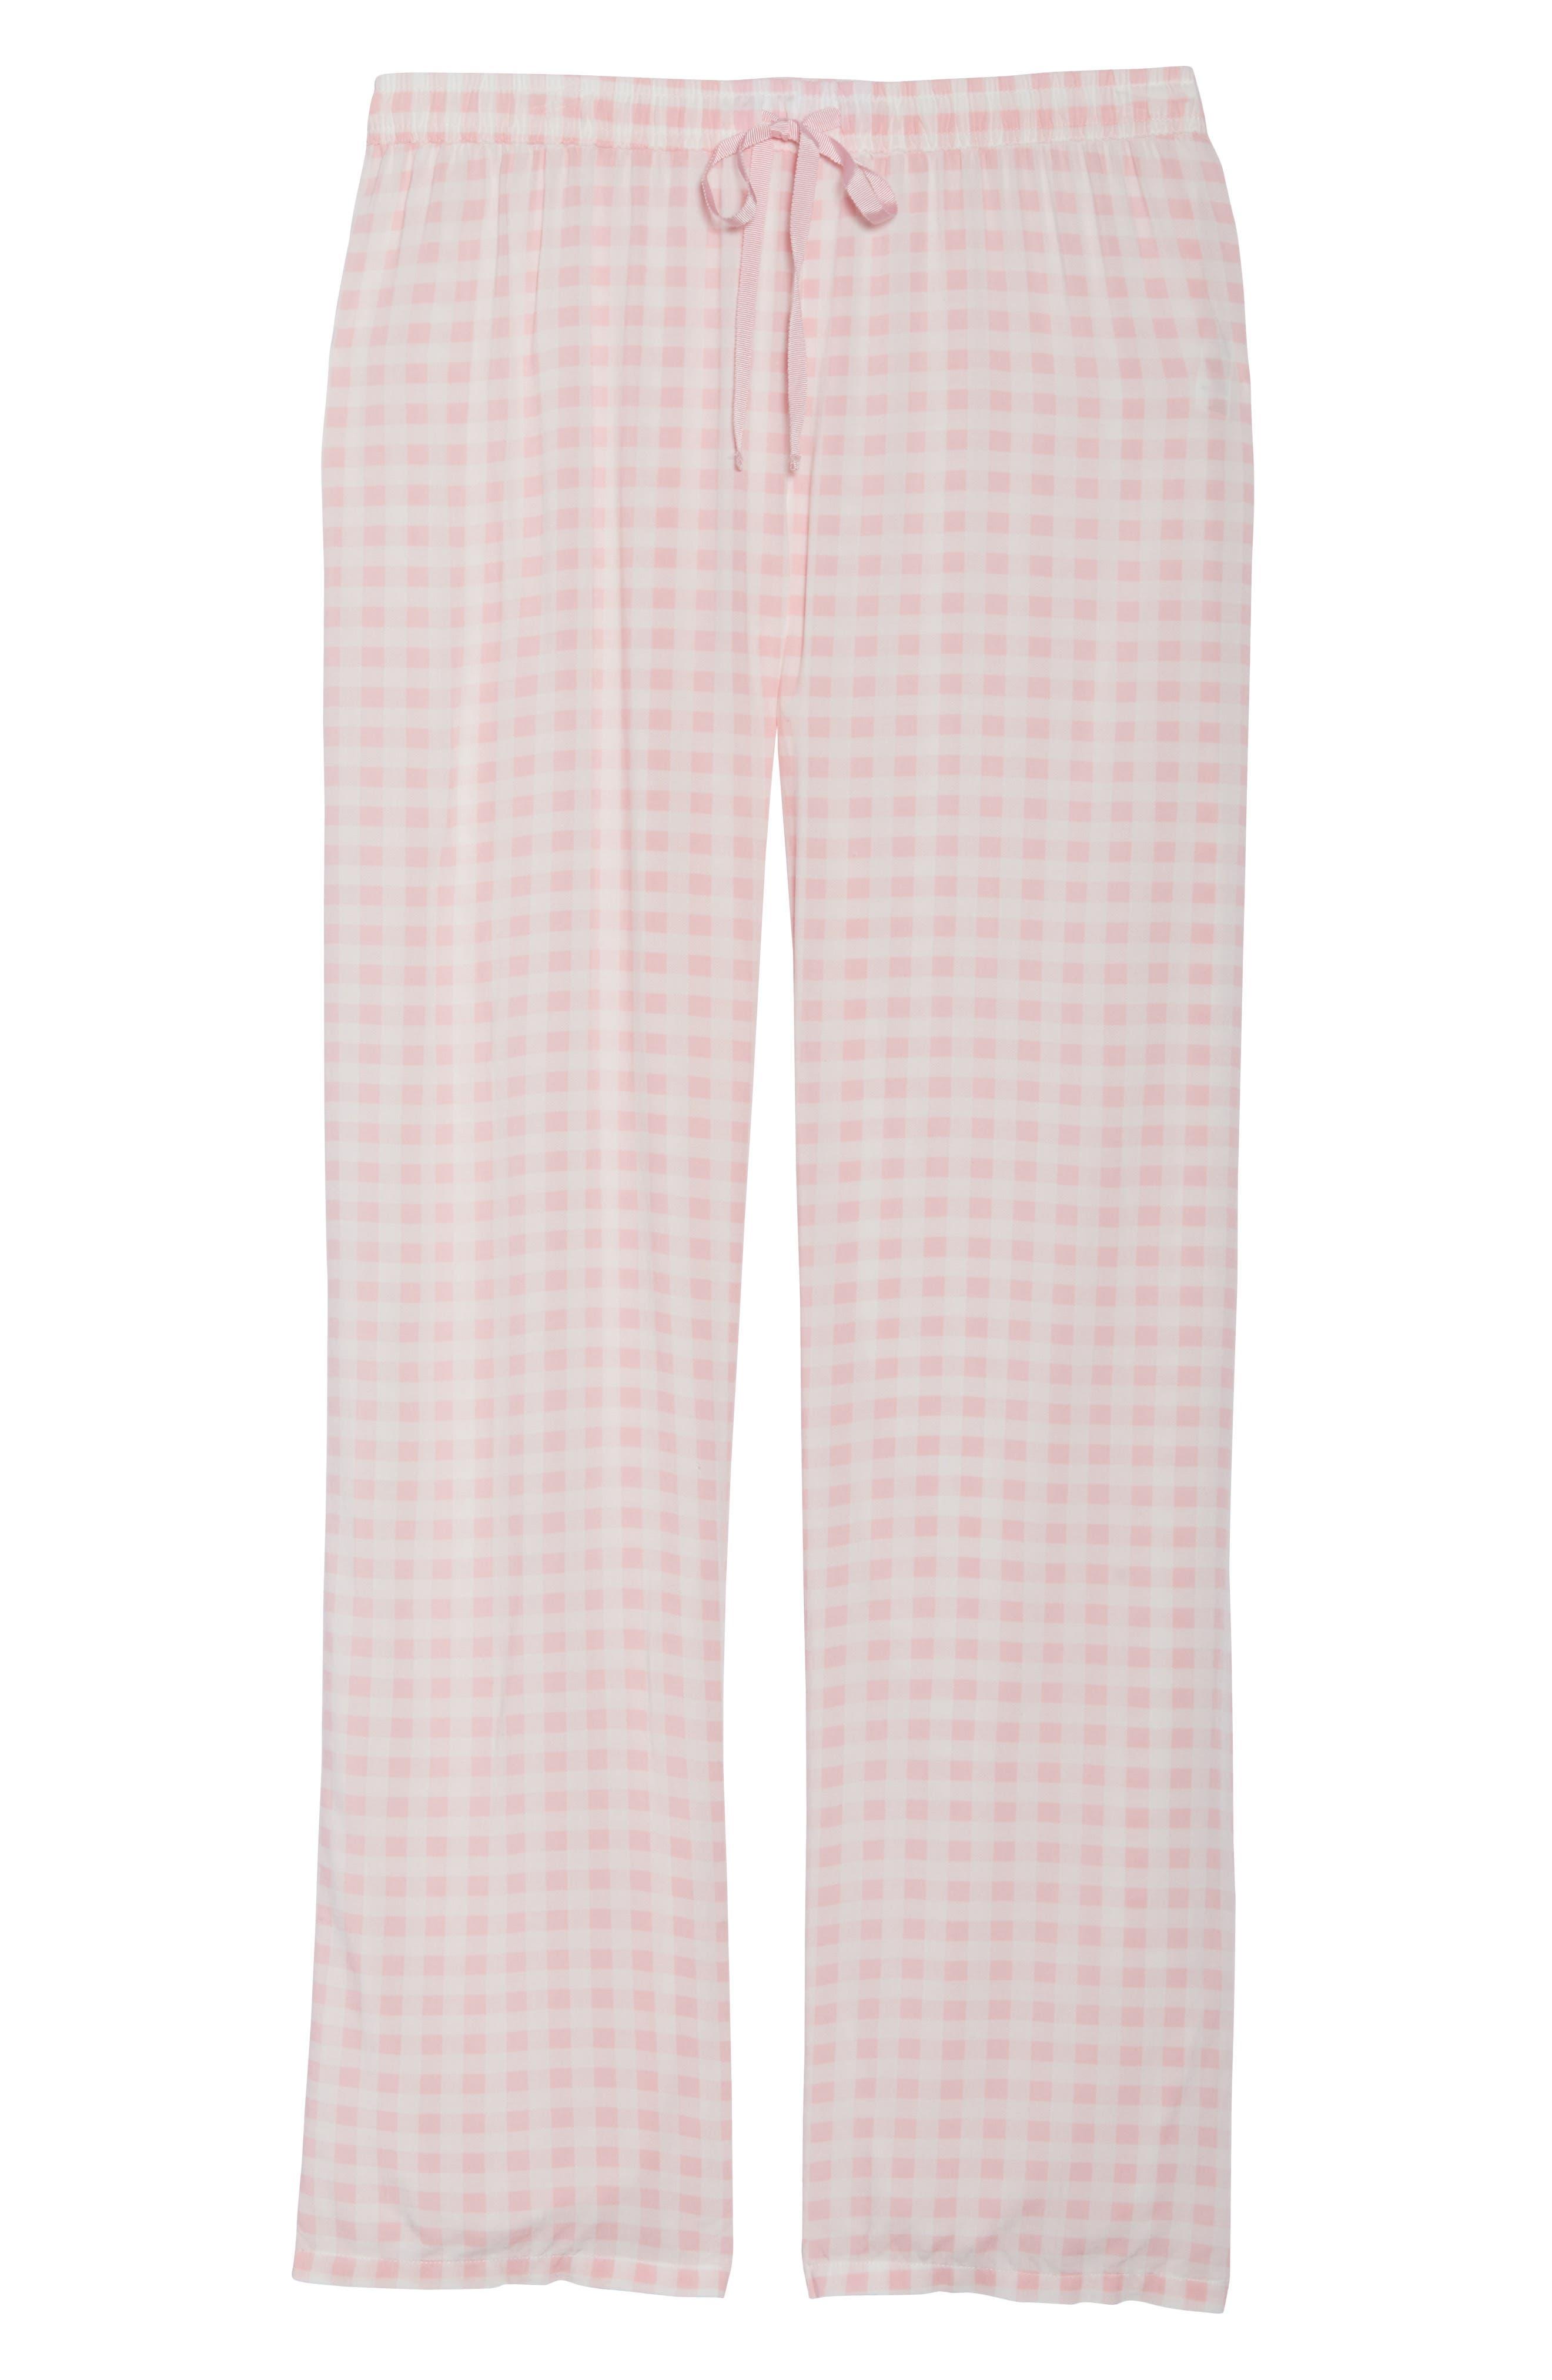 Gingham Pajama Pants,                             Alternate thumbnail 6, color,